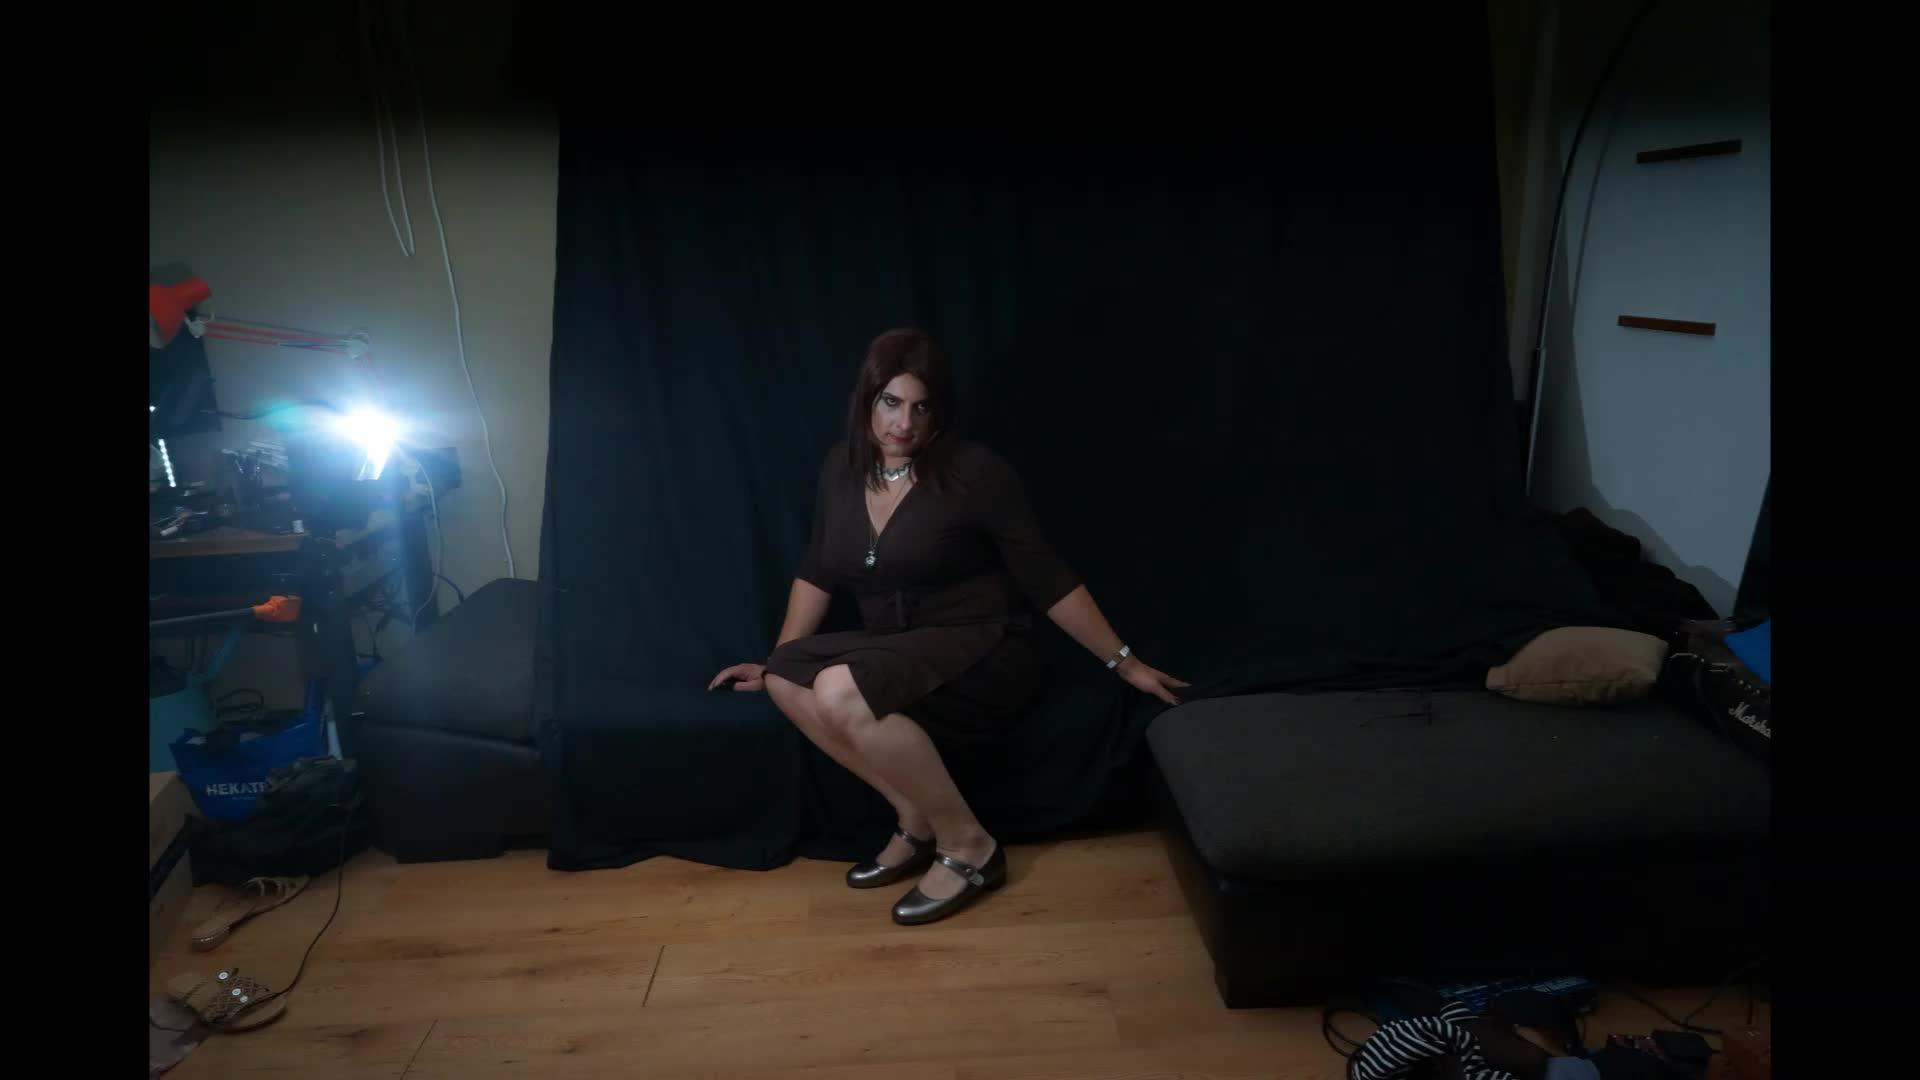 intervyu-s-transseksualom-porno-vzroslie-babi-video